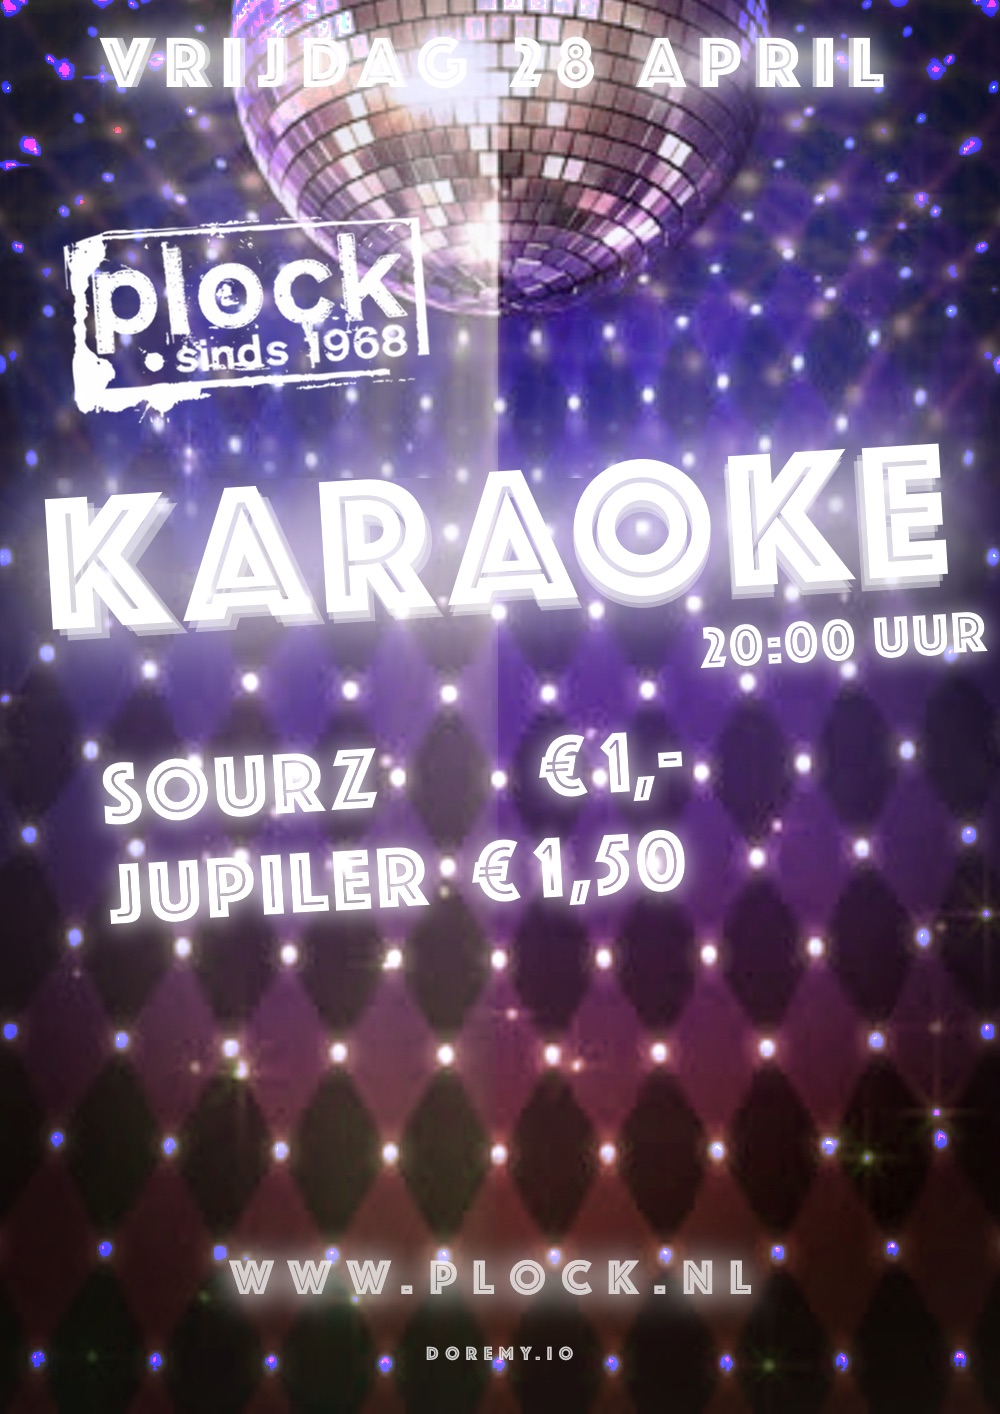 Karaoke 28 April 2017 @Plock